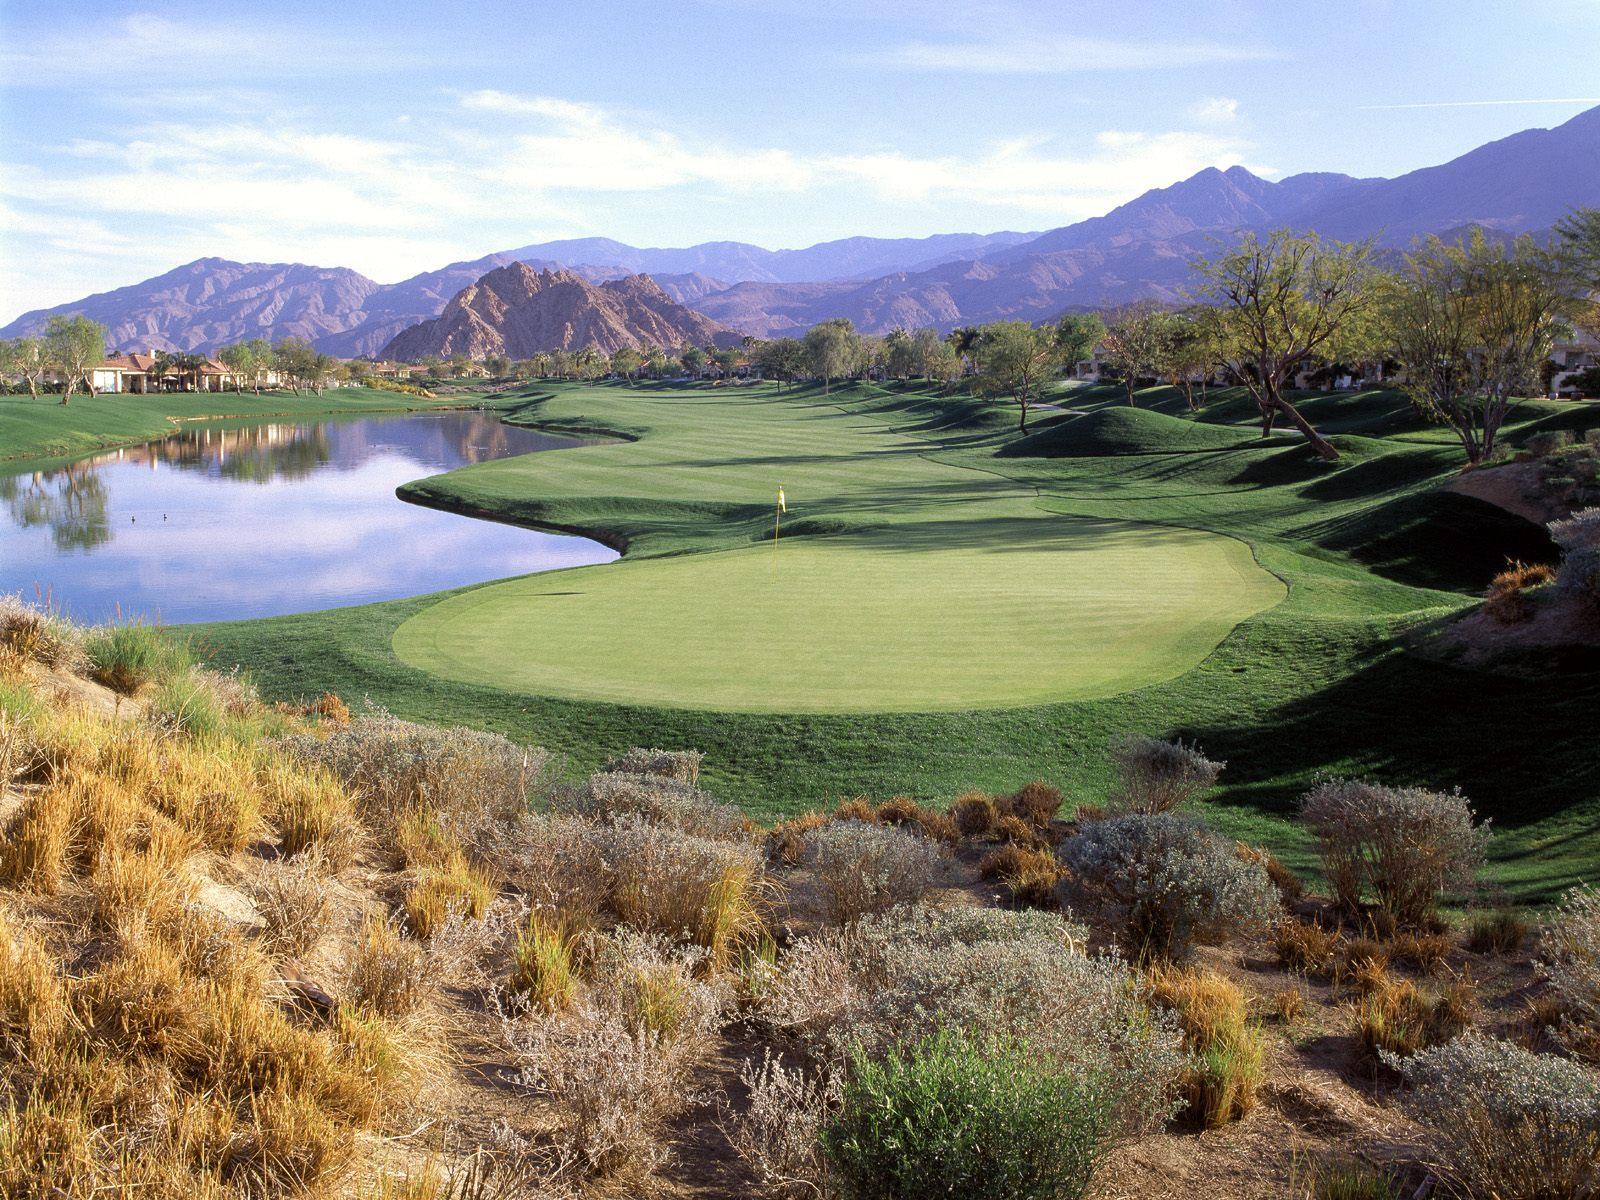 Wallpaper - Golf links